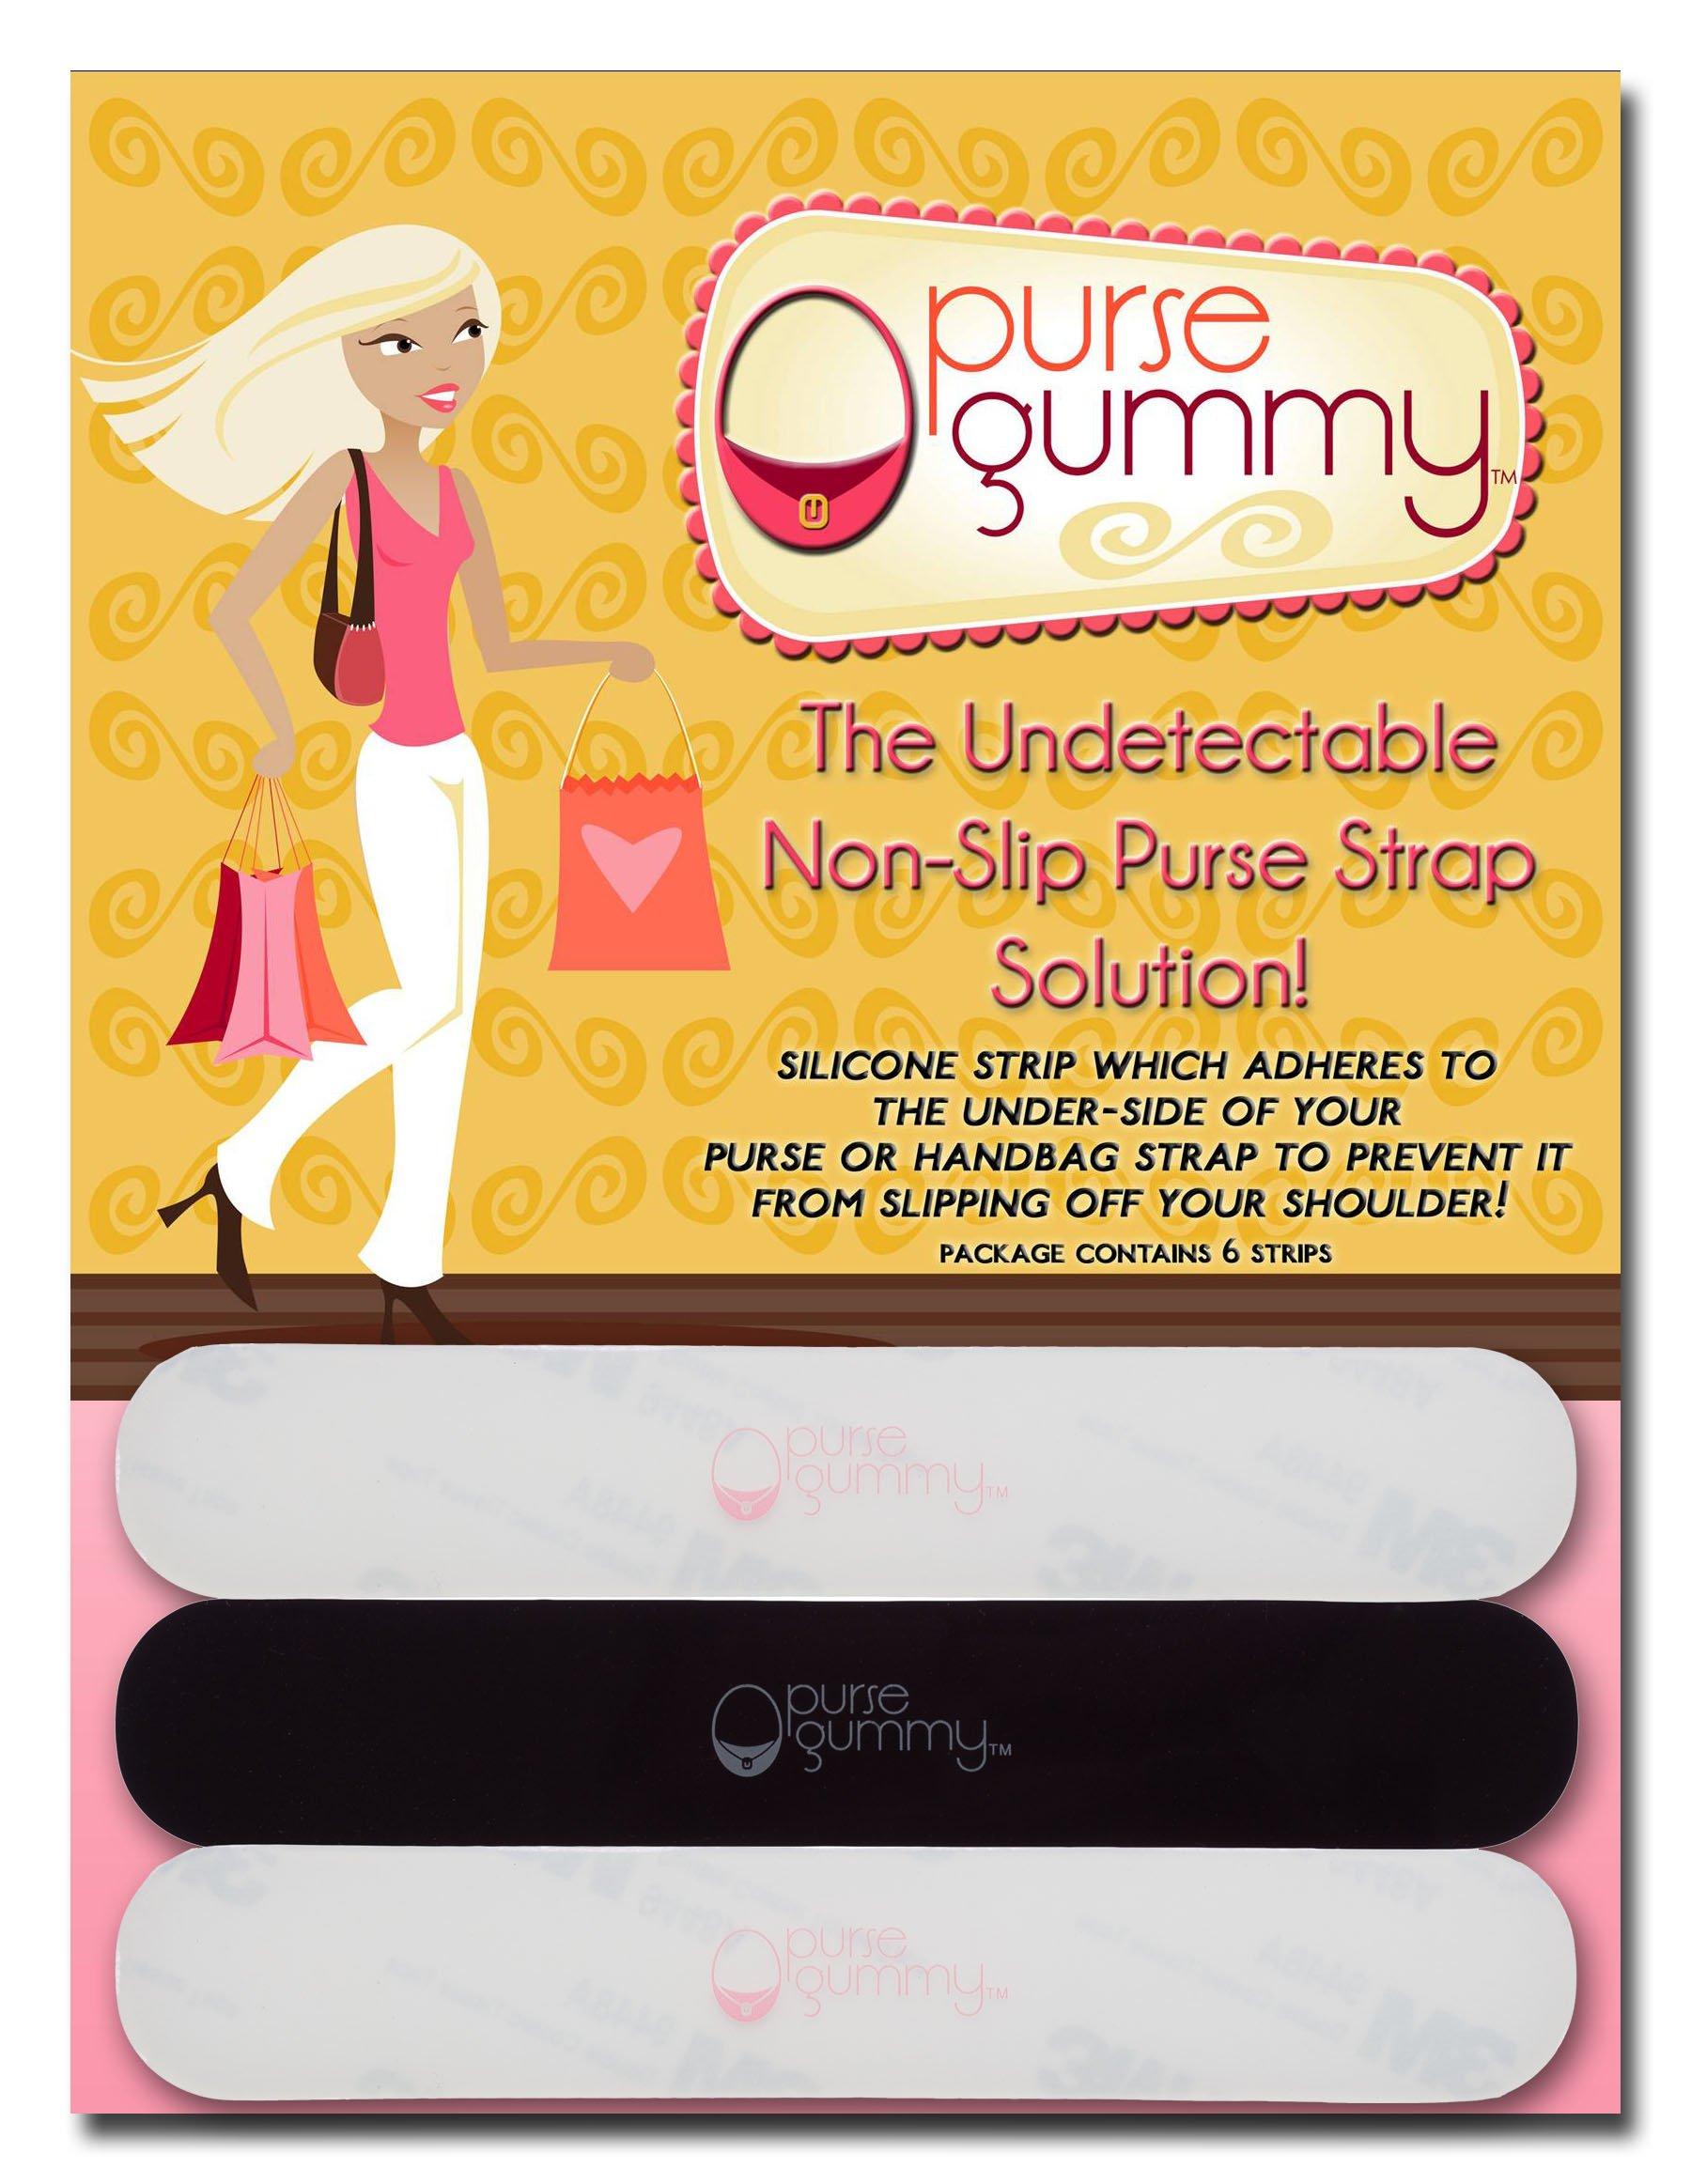 Purse Gummy The Original Non Slip Shoulder Bag Handbag Purse Strap Grip Pad Cushion Accessory - Set of 6 Pieces (Black & Semi-Clear) by Purse Gummy